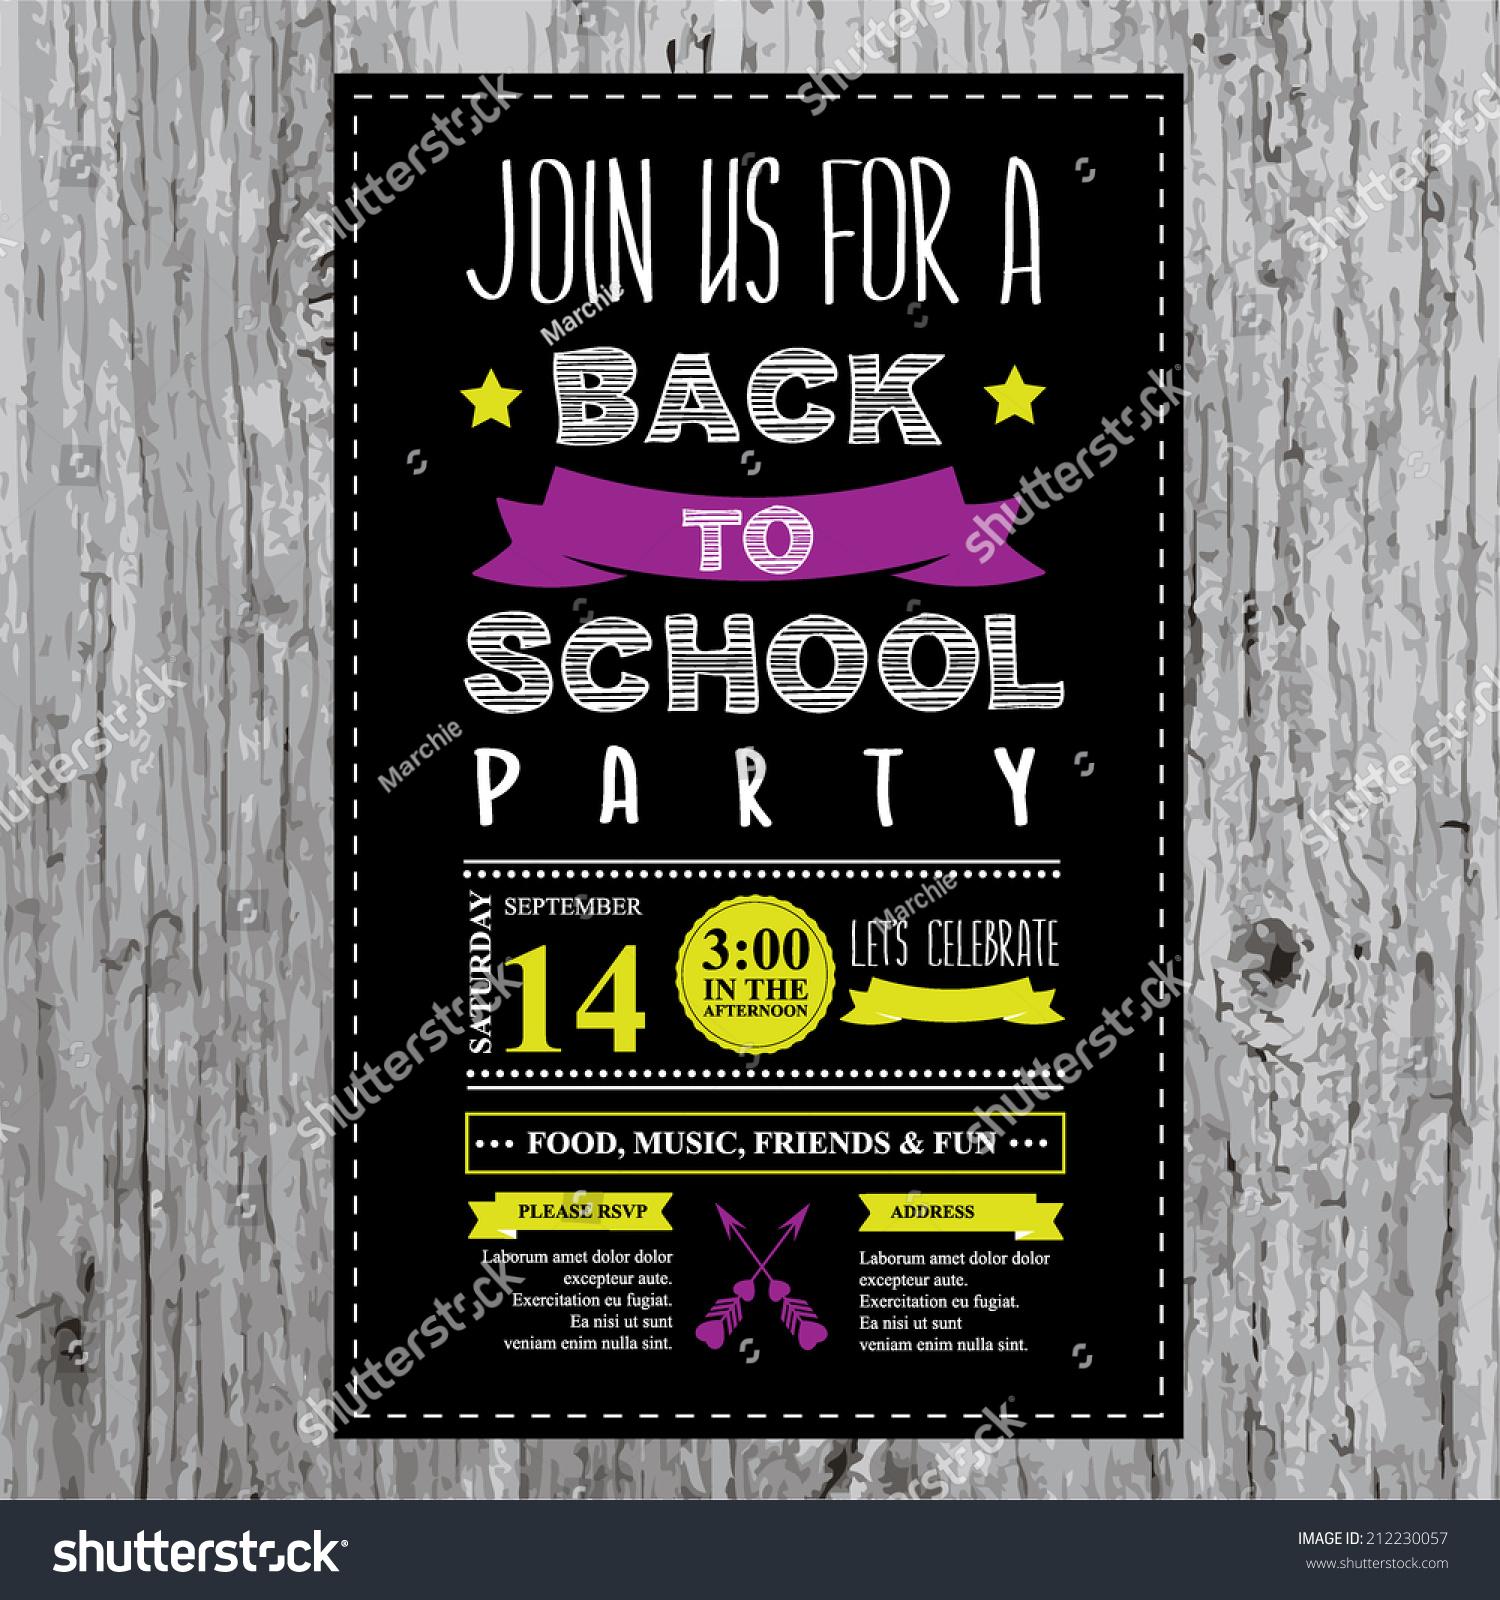 Back School Party Invitation Design Template Stock Vector ...